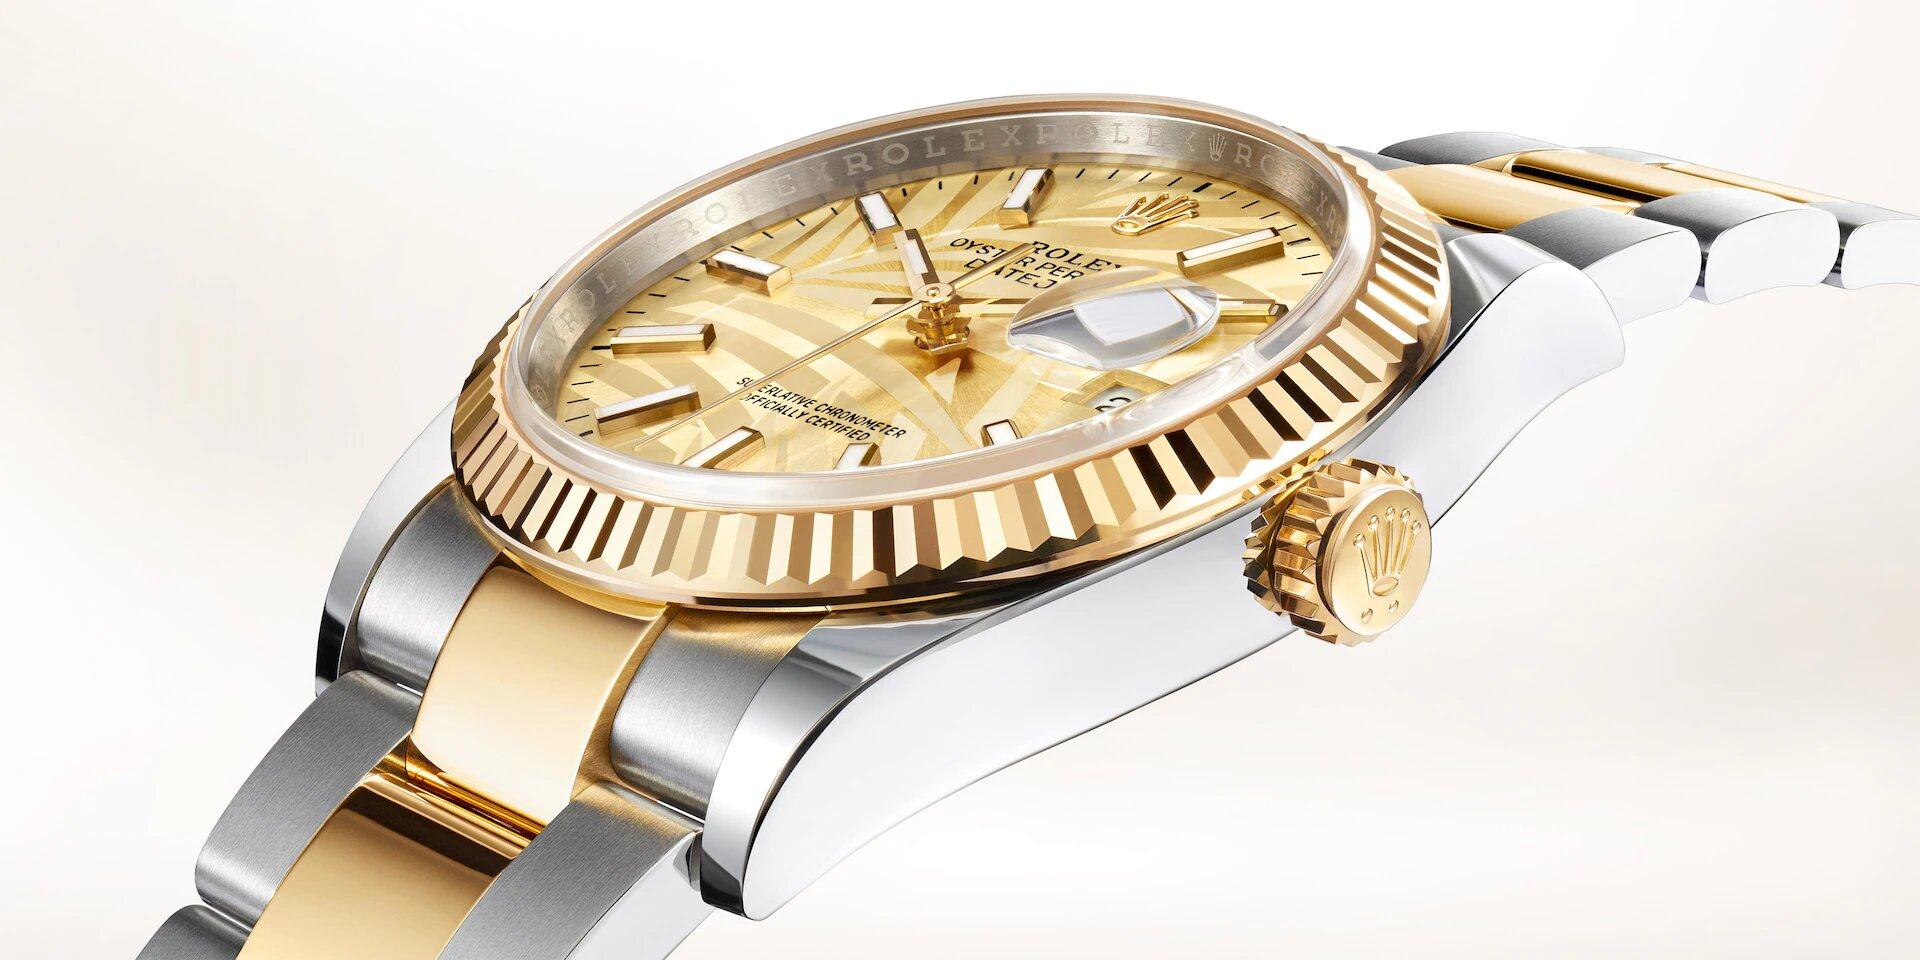 Rolex Datejust 36 126233 Detalle carrura